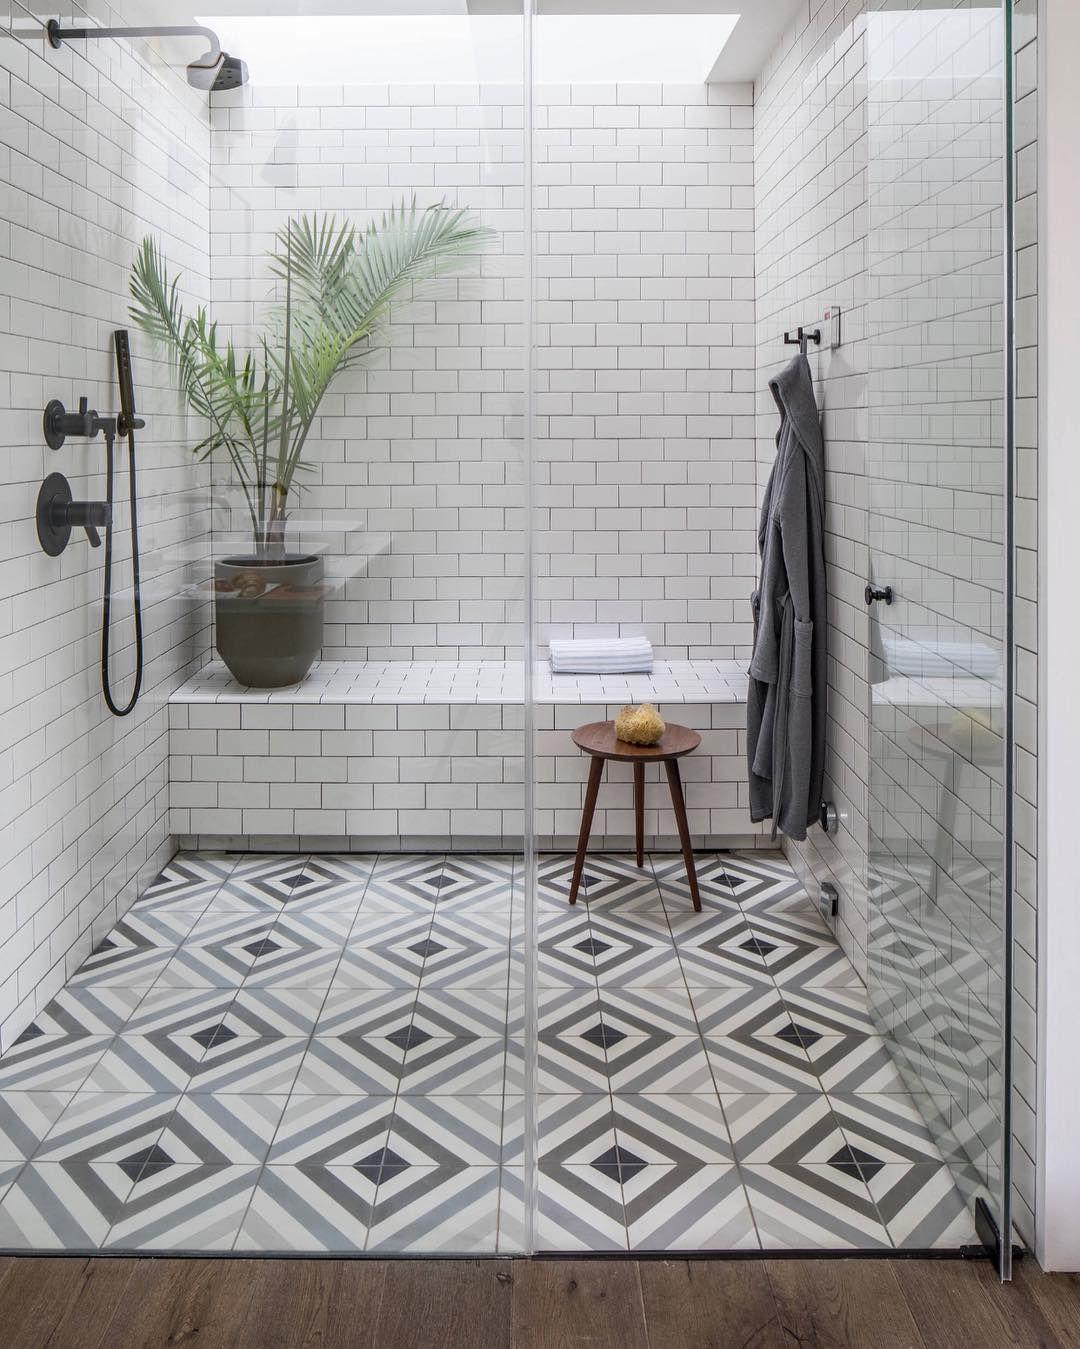 Very Simple Shower Room With White Subway Tiles For The Walls Encaustic Cement Tiles For Flooring Ceme Bathroom Floor Tiles Bathroom Remodel Tile Shower Tile